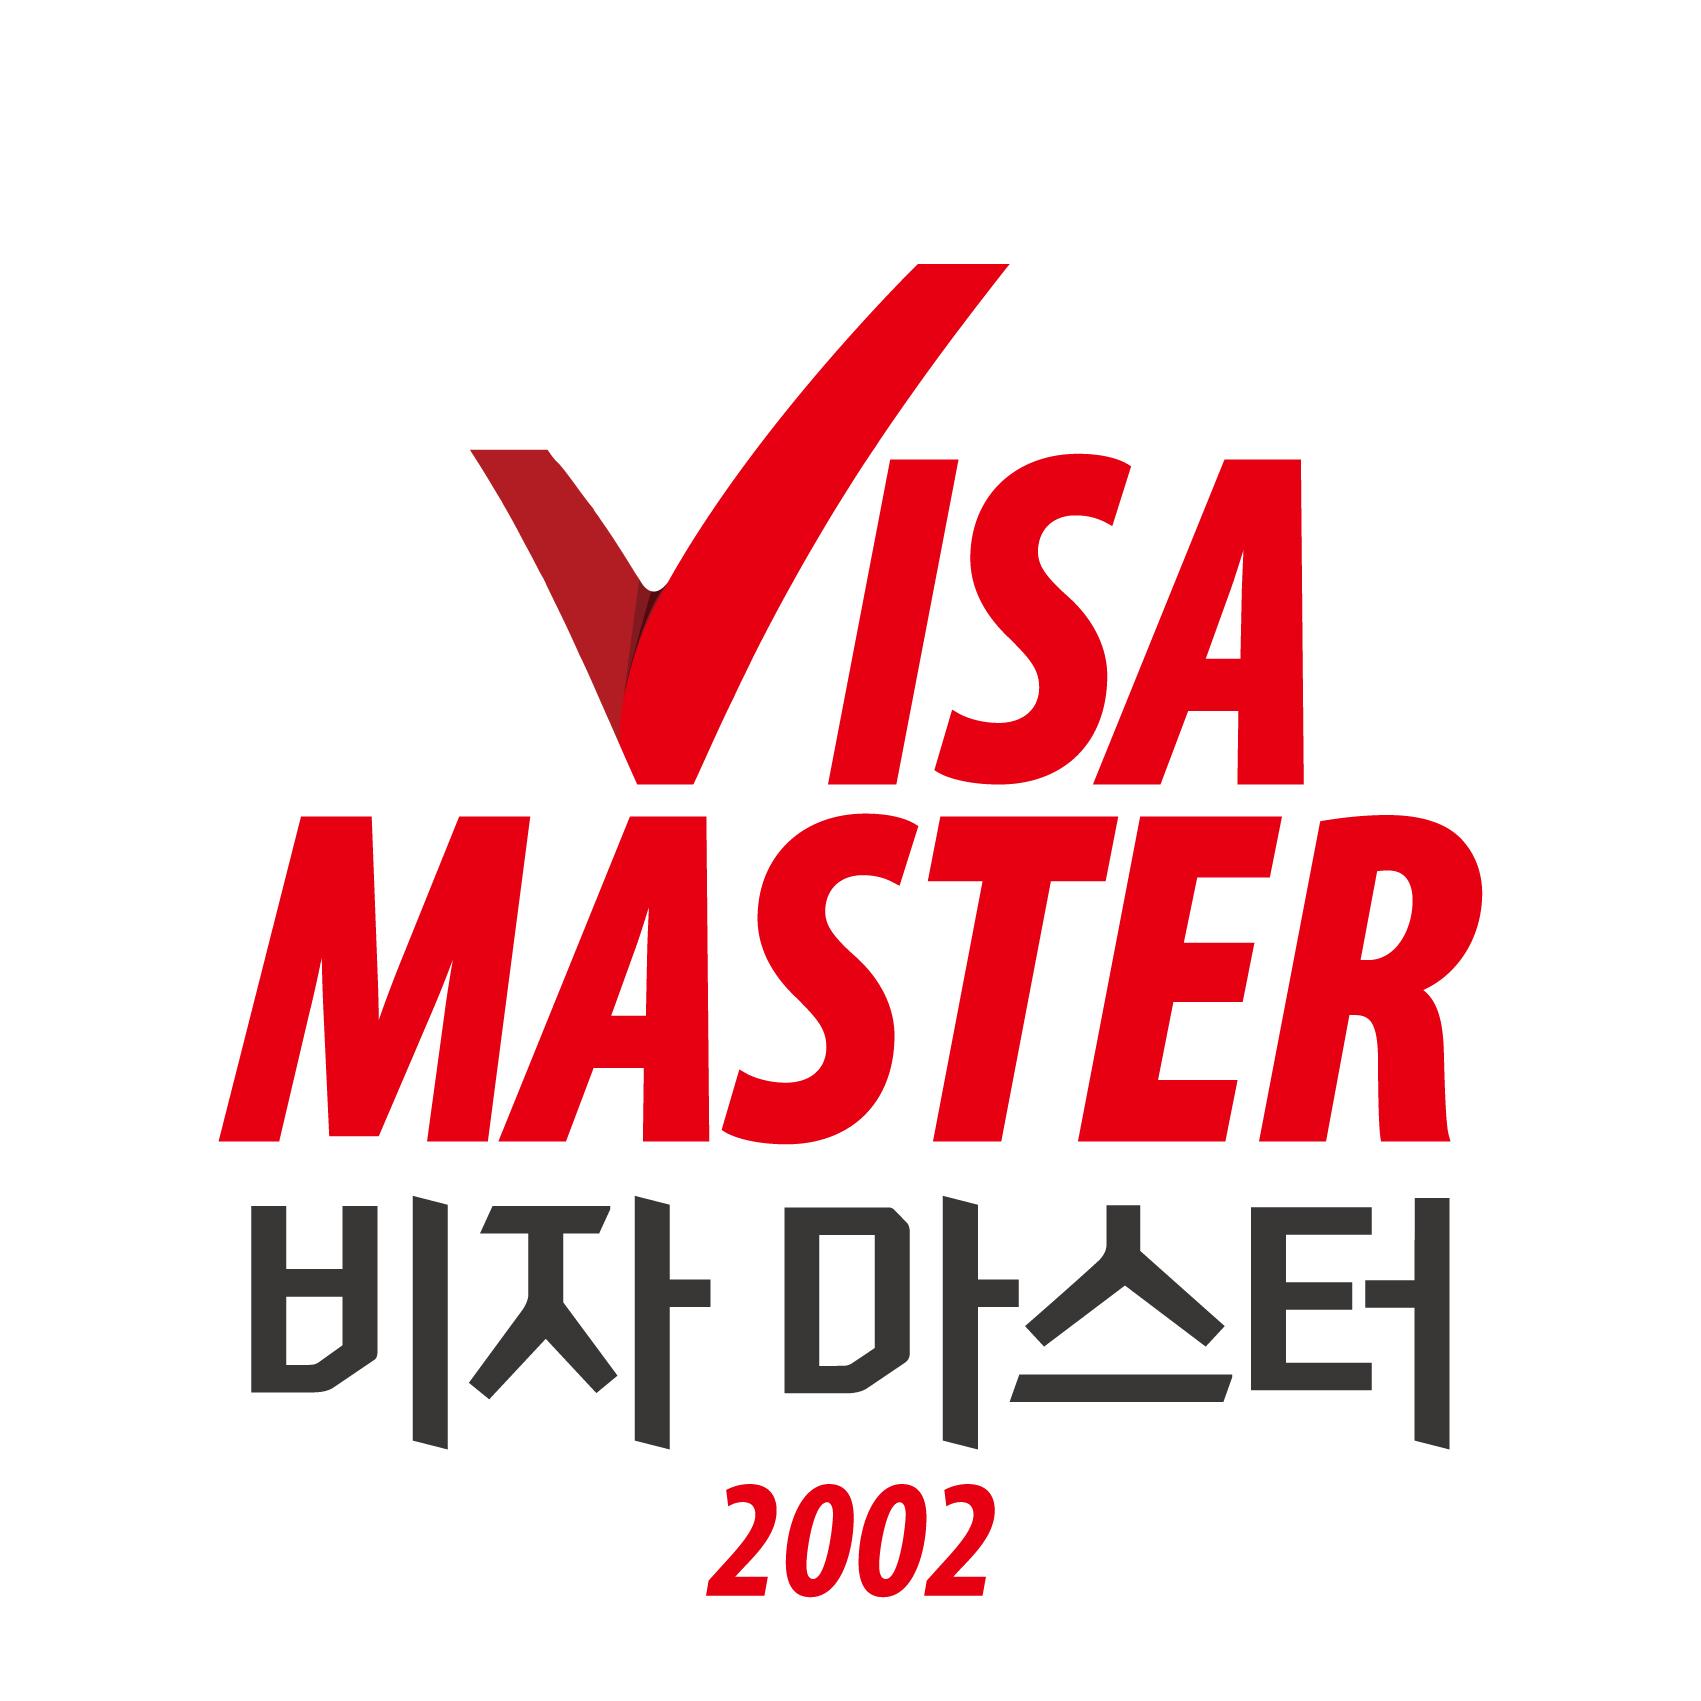 Visamaster Logo.jpeg